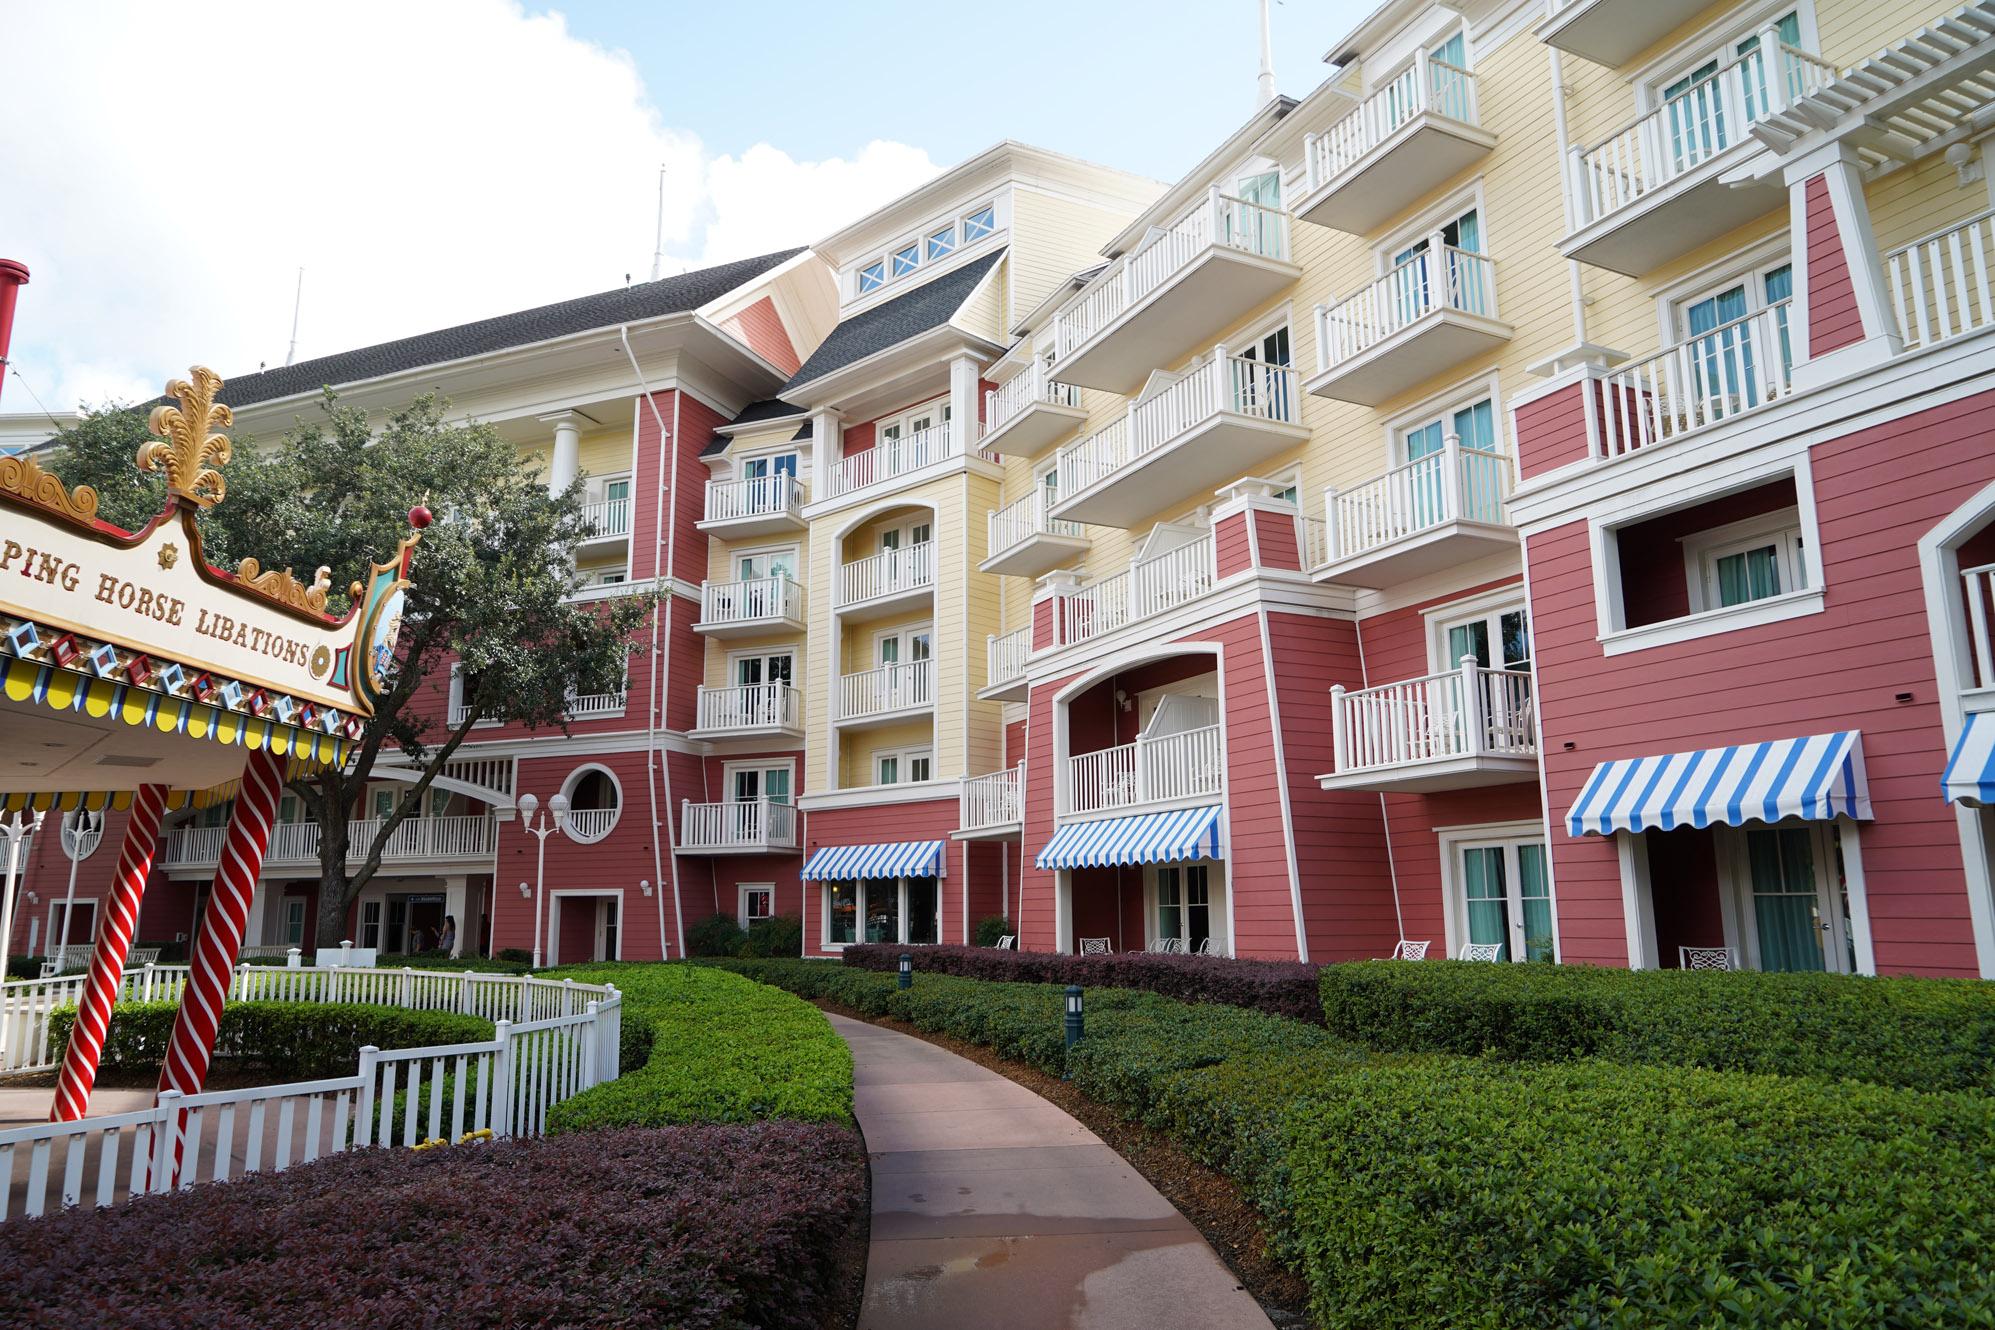 Disney Deluxe Resort Boardwalk Inn